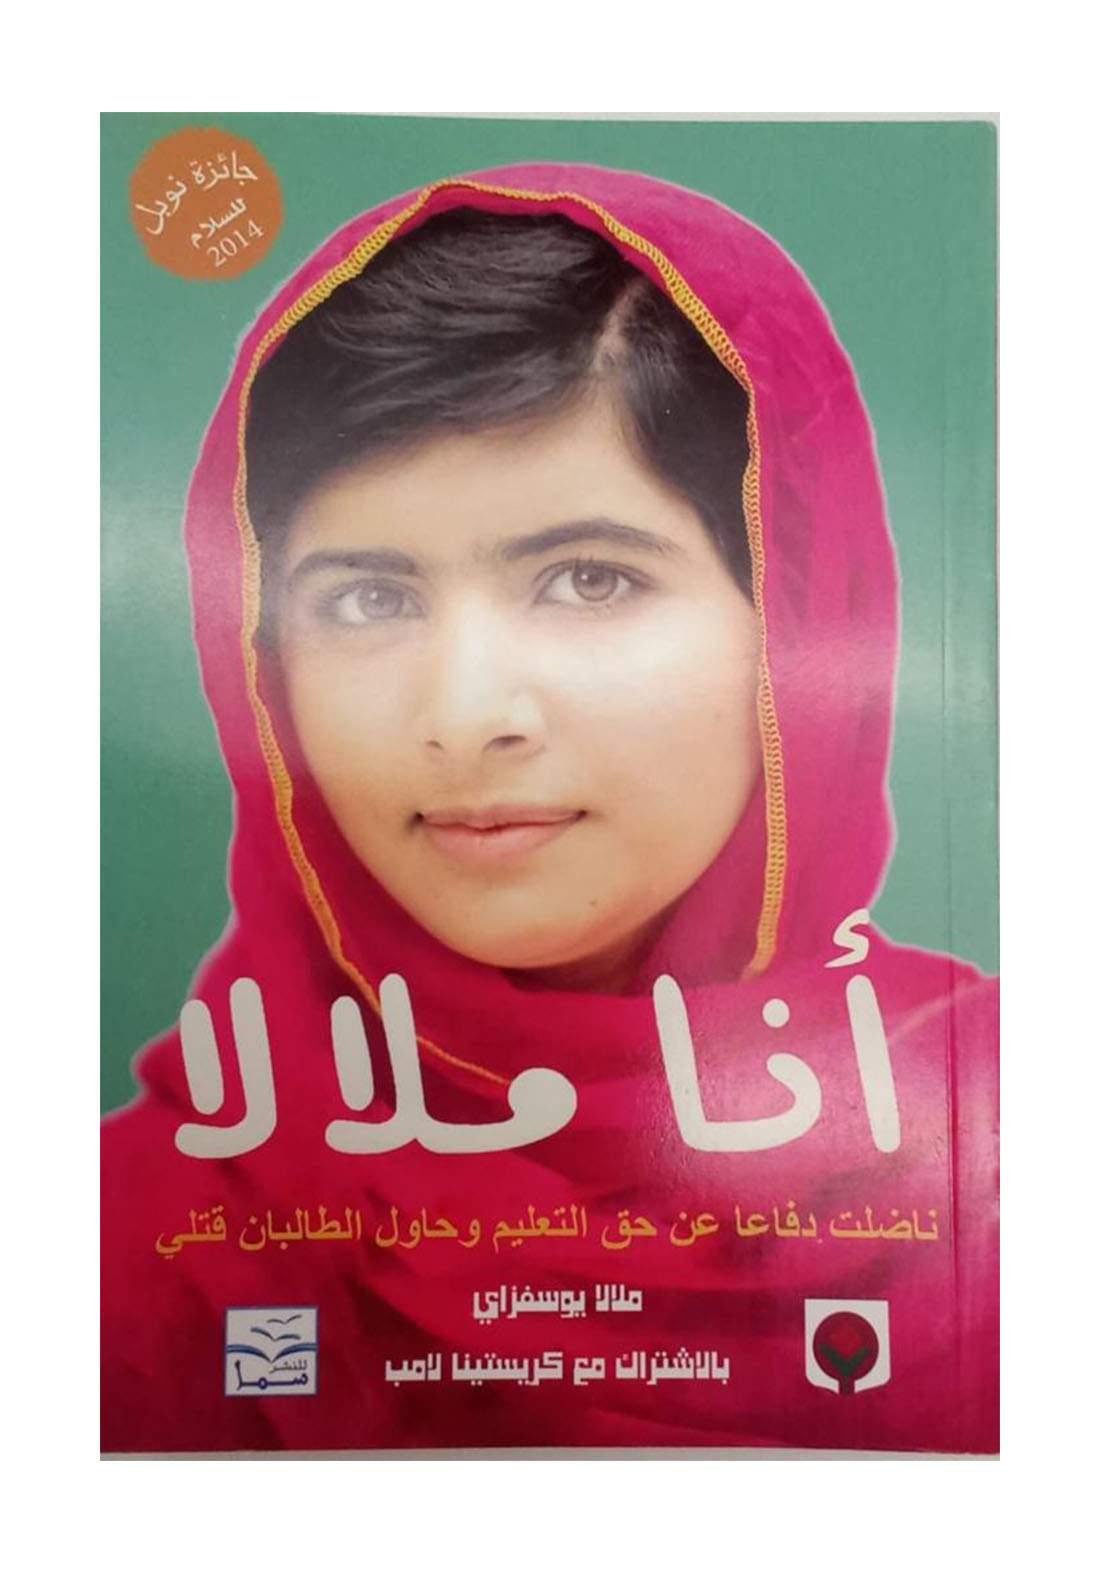 انا مالالا